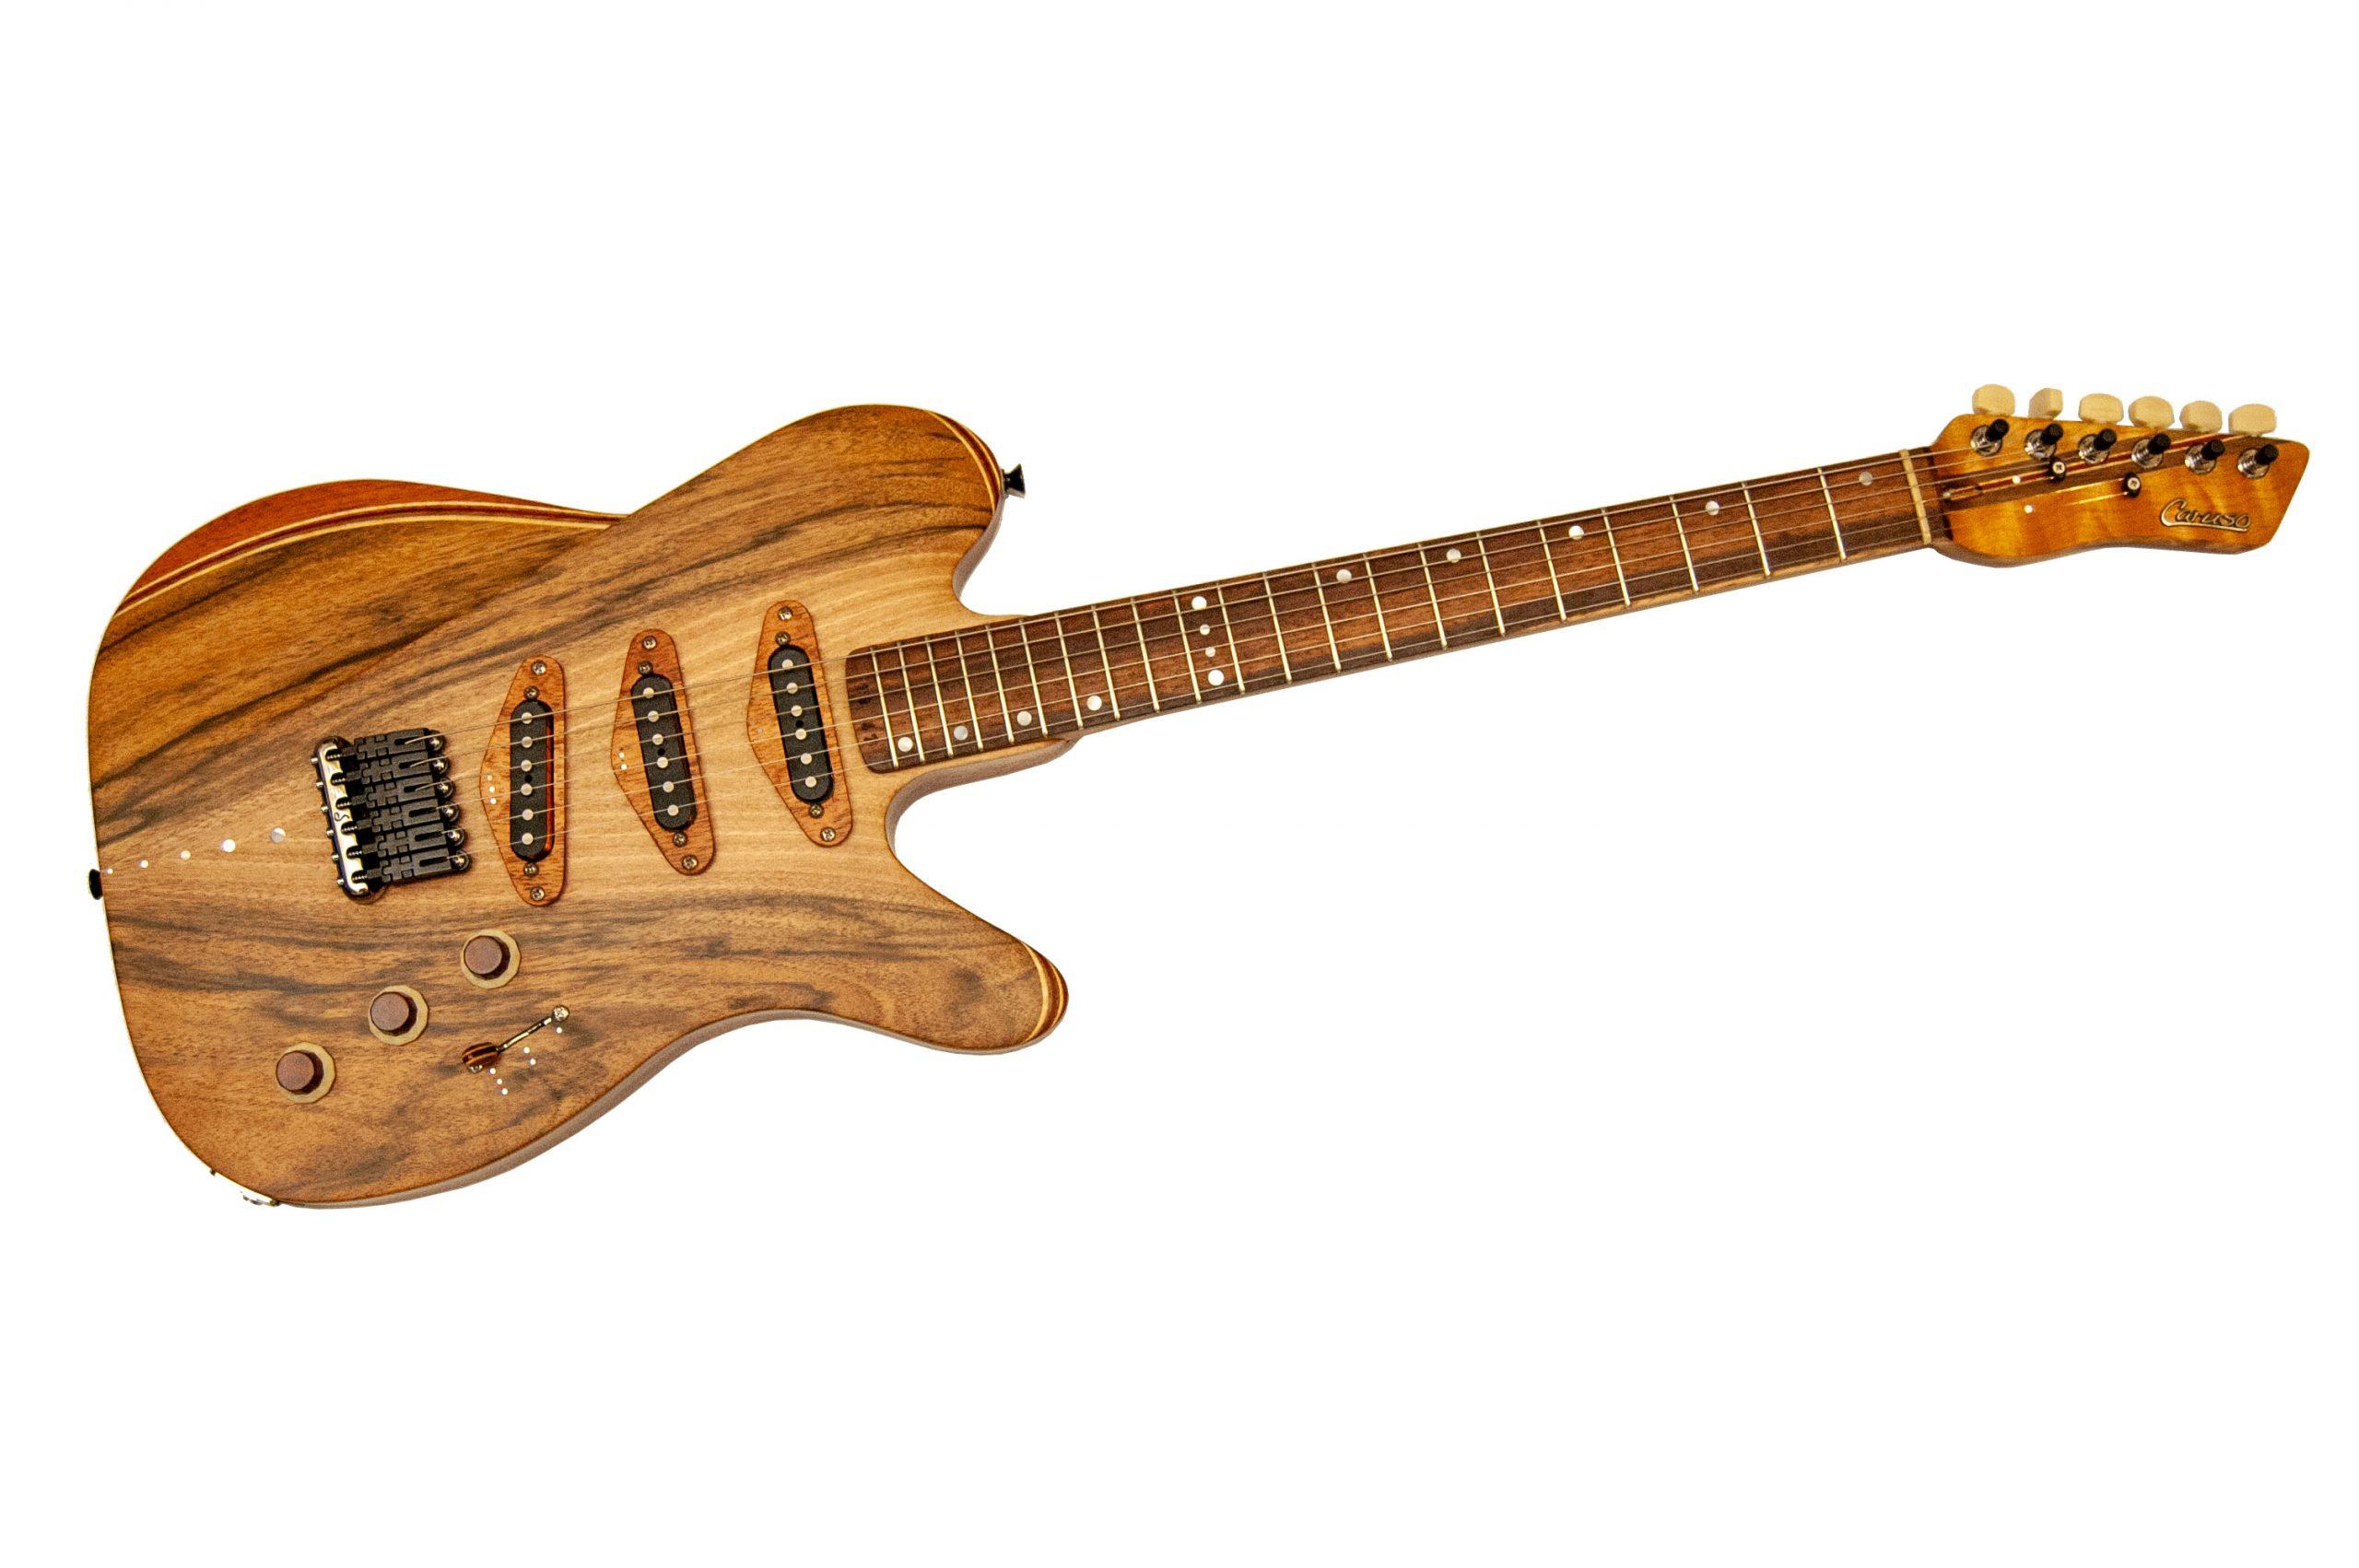 Caruso Custom Guitars